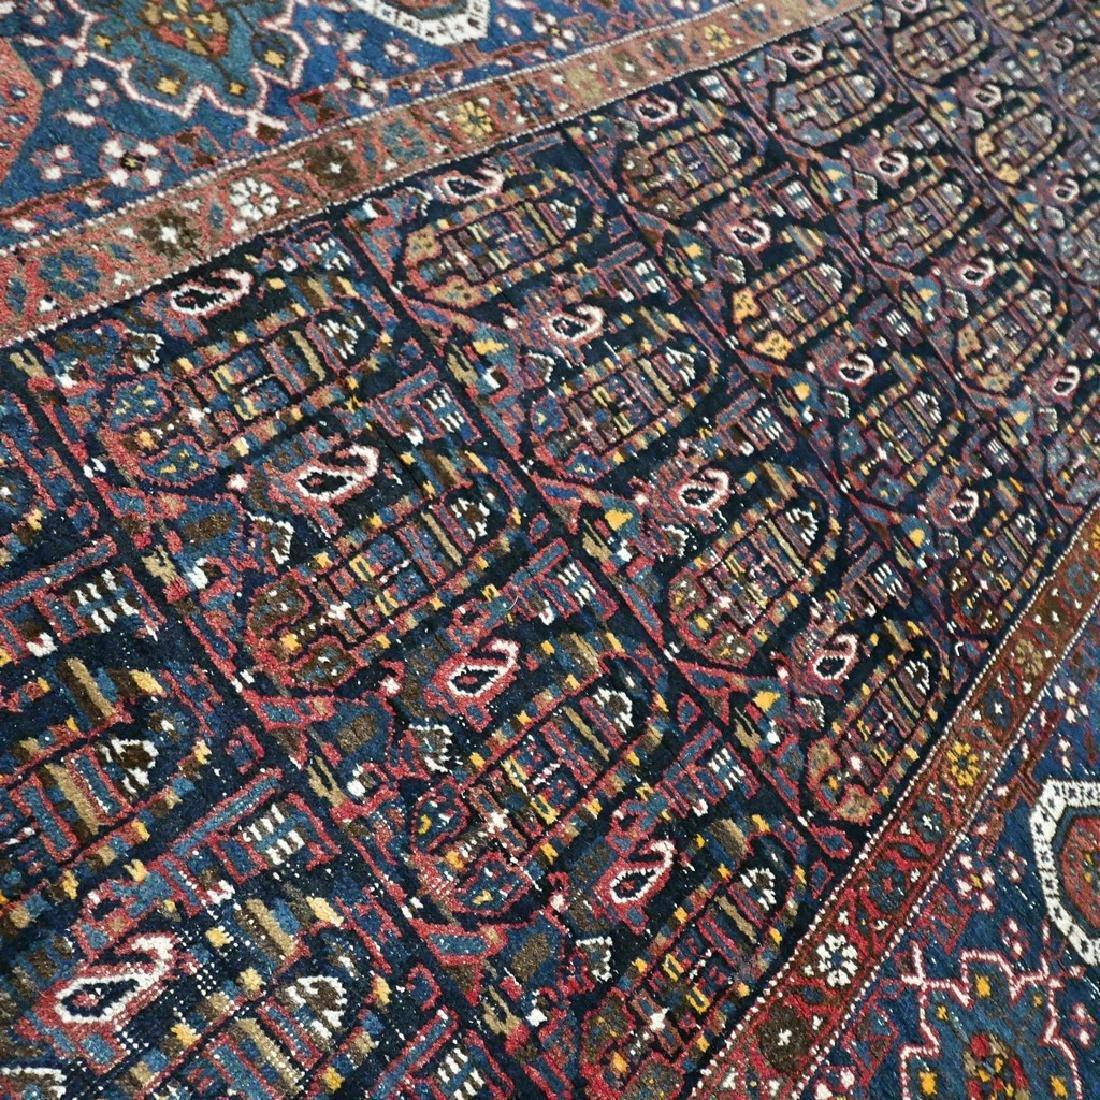 10.1x4.3 Antique Armenian boteh Kazak rug - 1880s - - 5